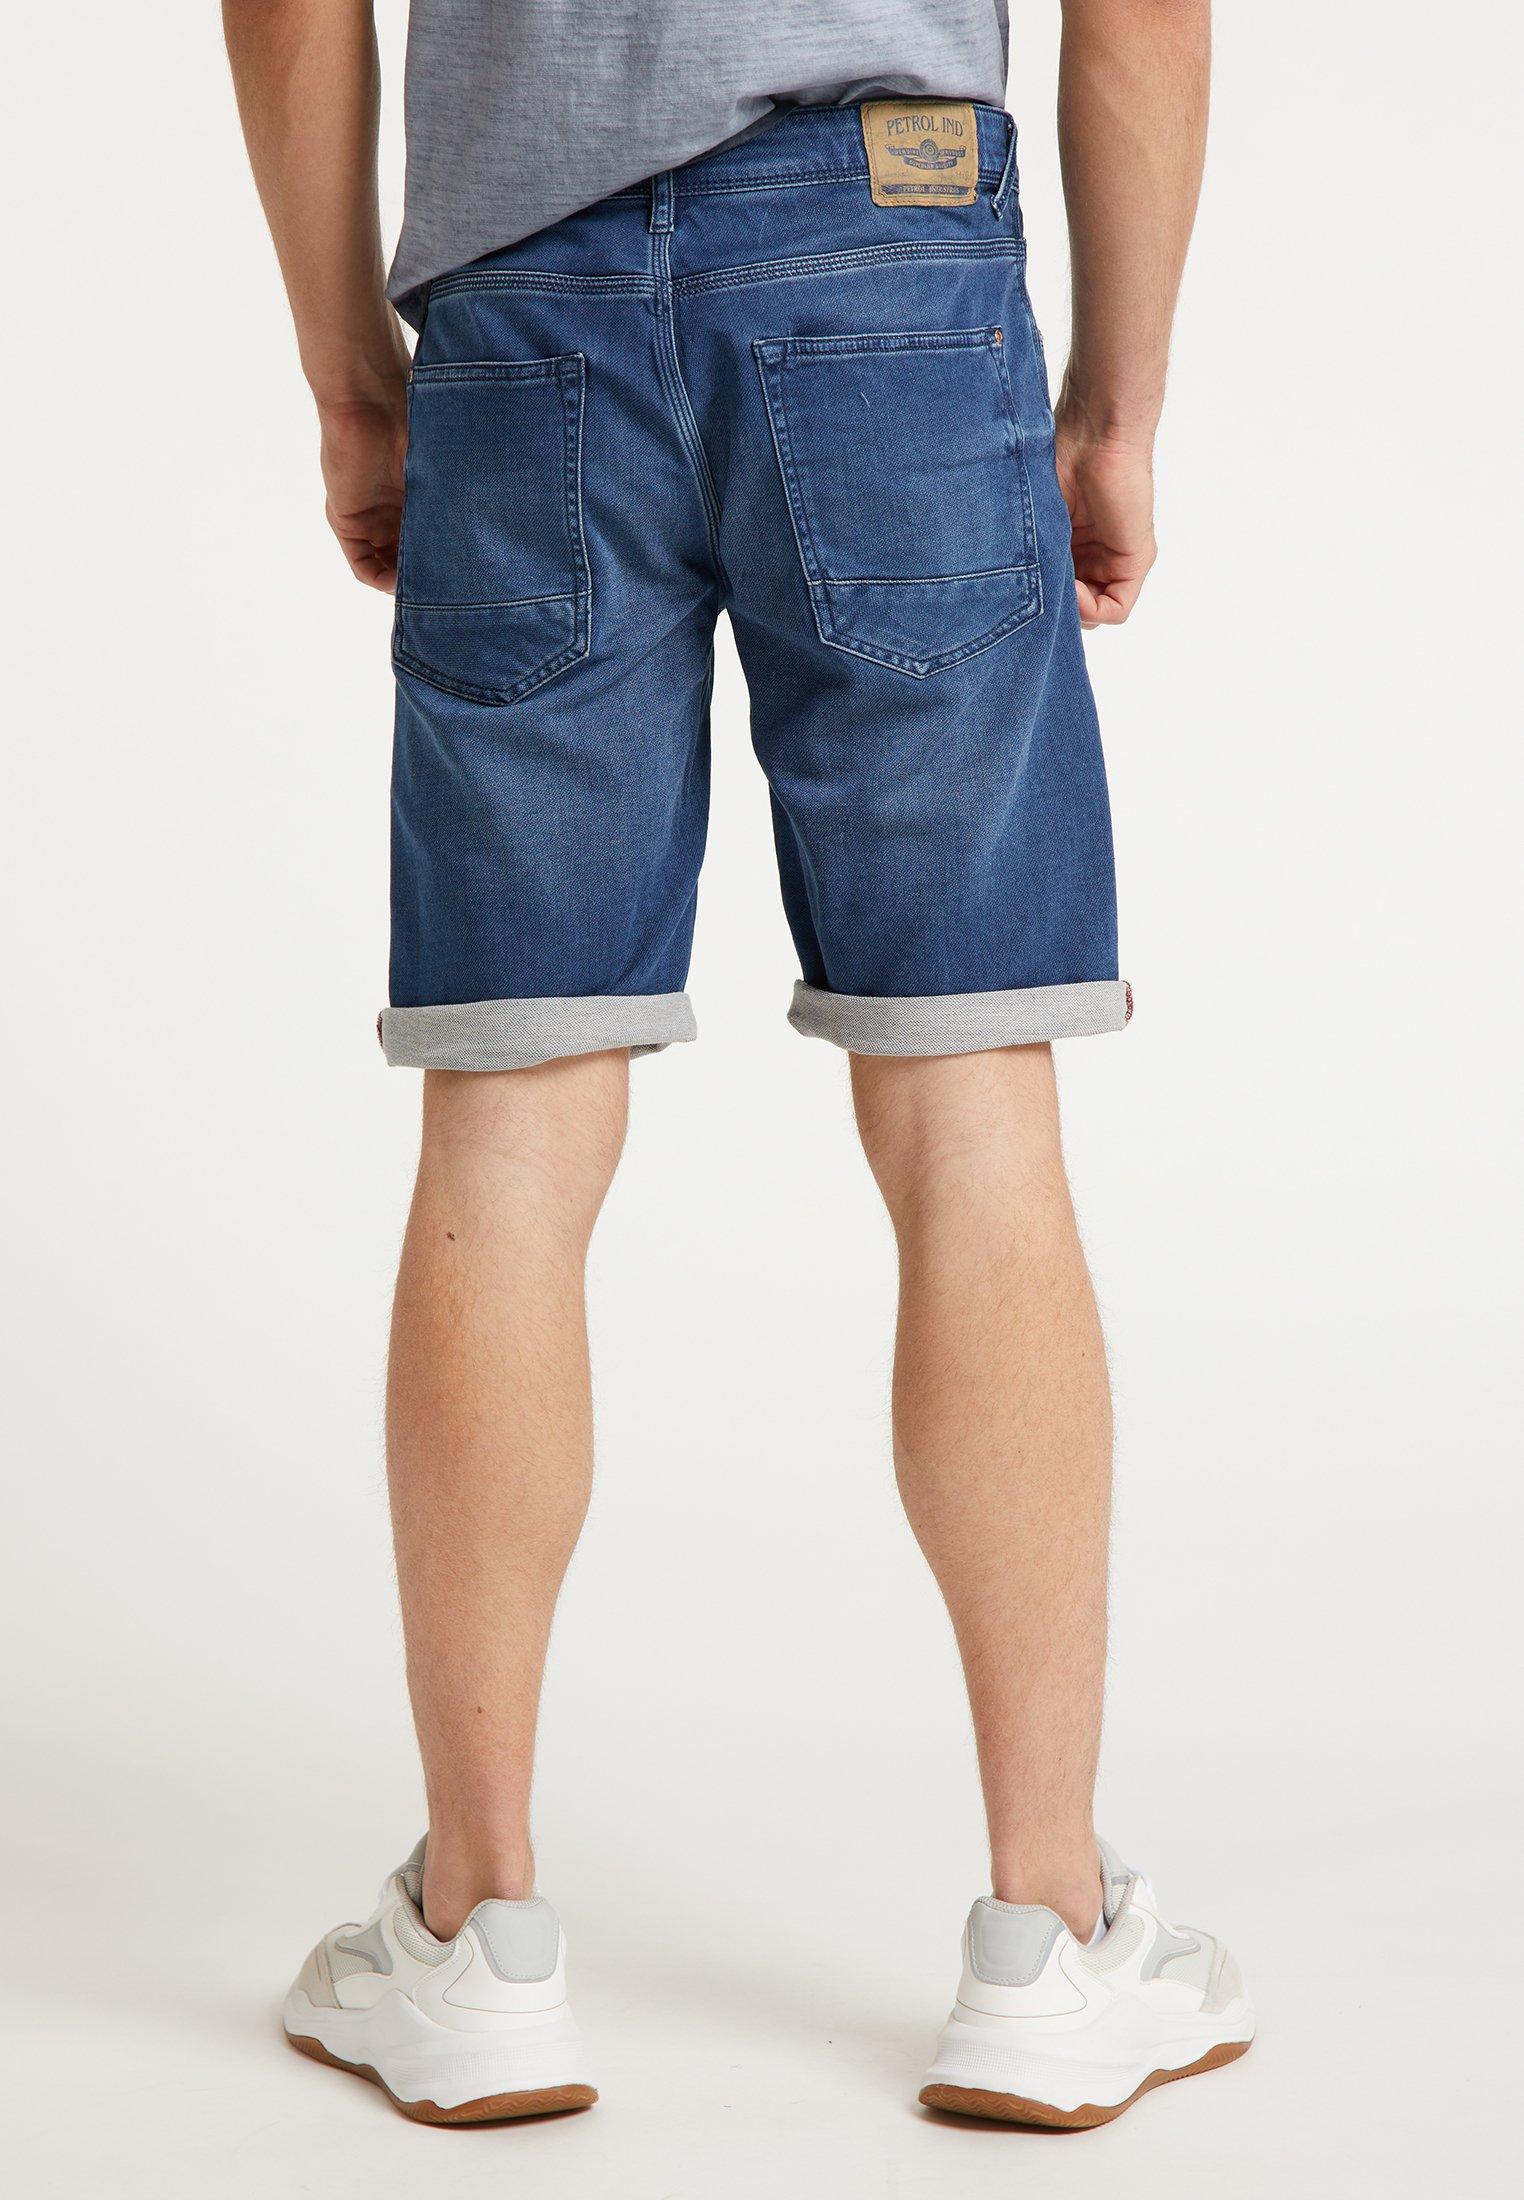 Petrol Industries Shorts - Jeans Dark Blue